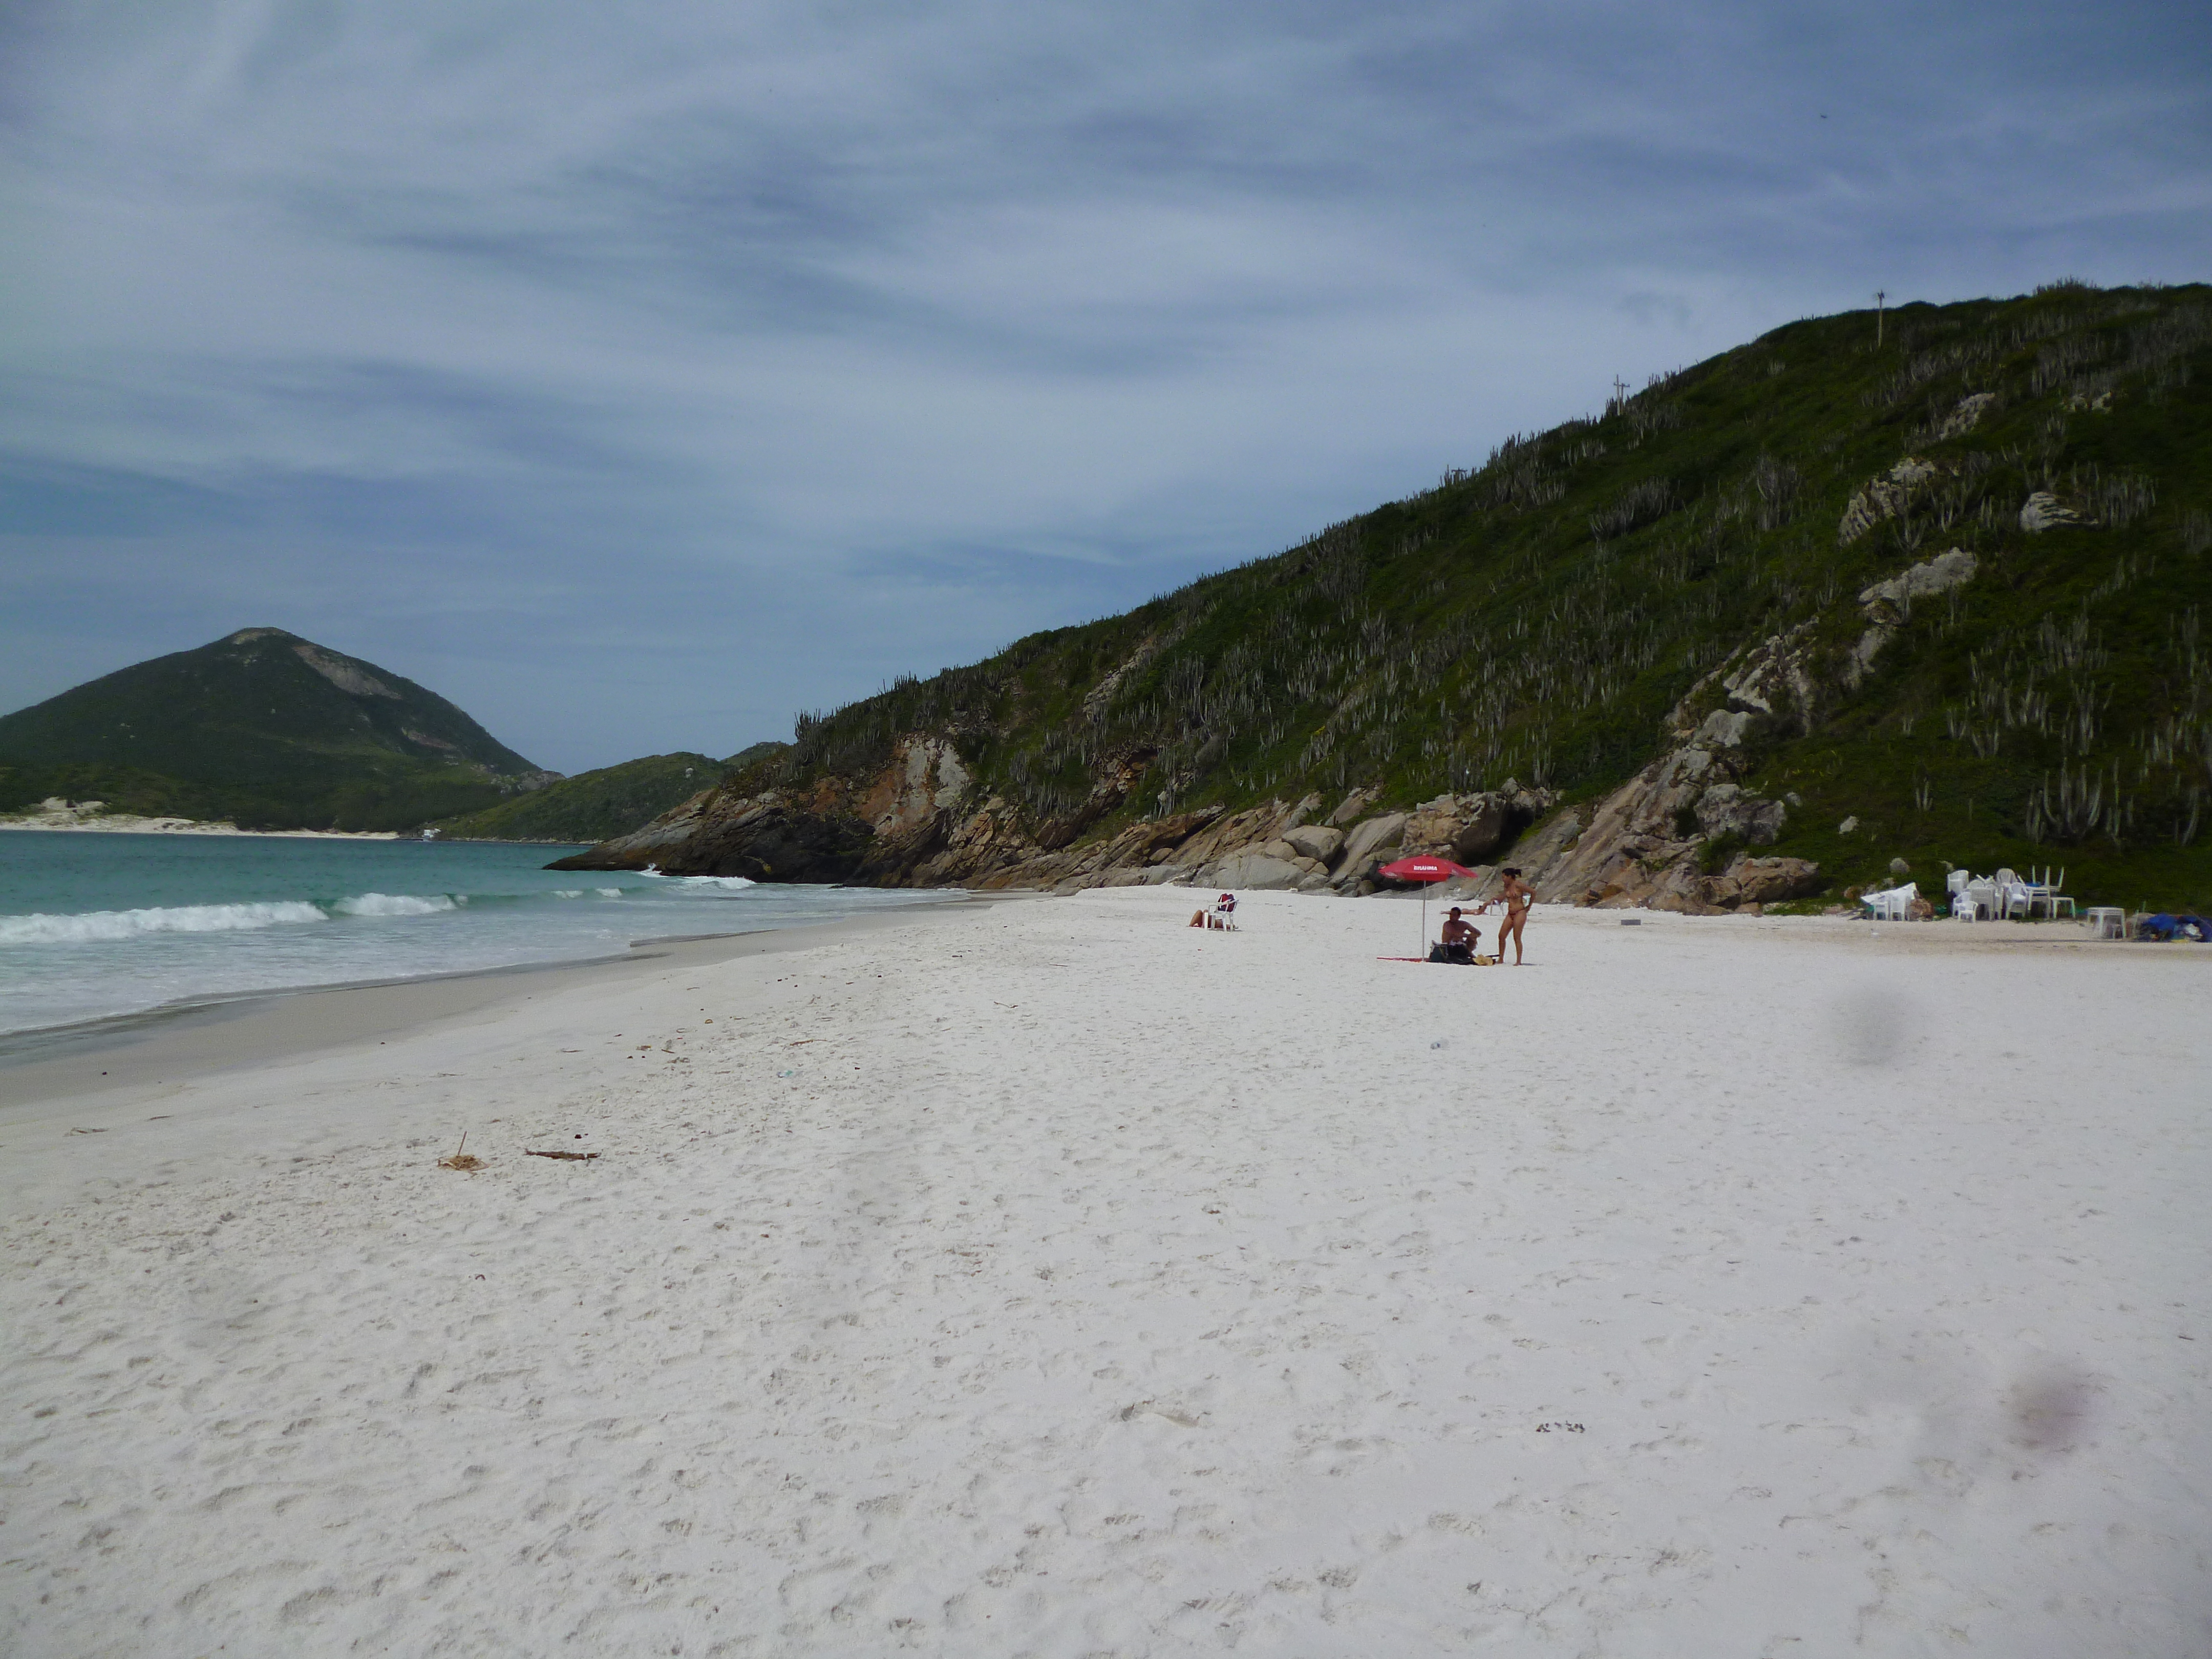 la prainha, la plage du sable qui chante